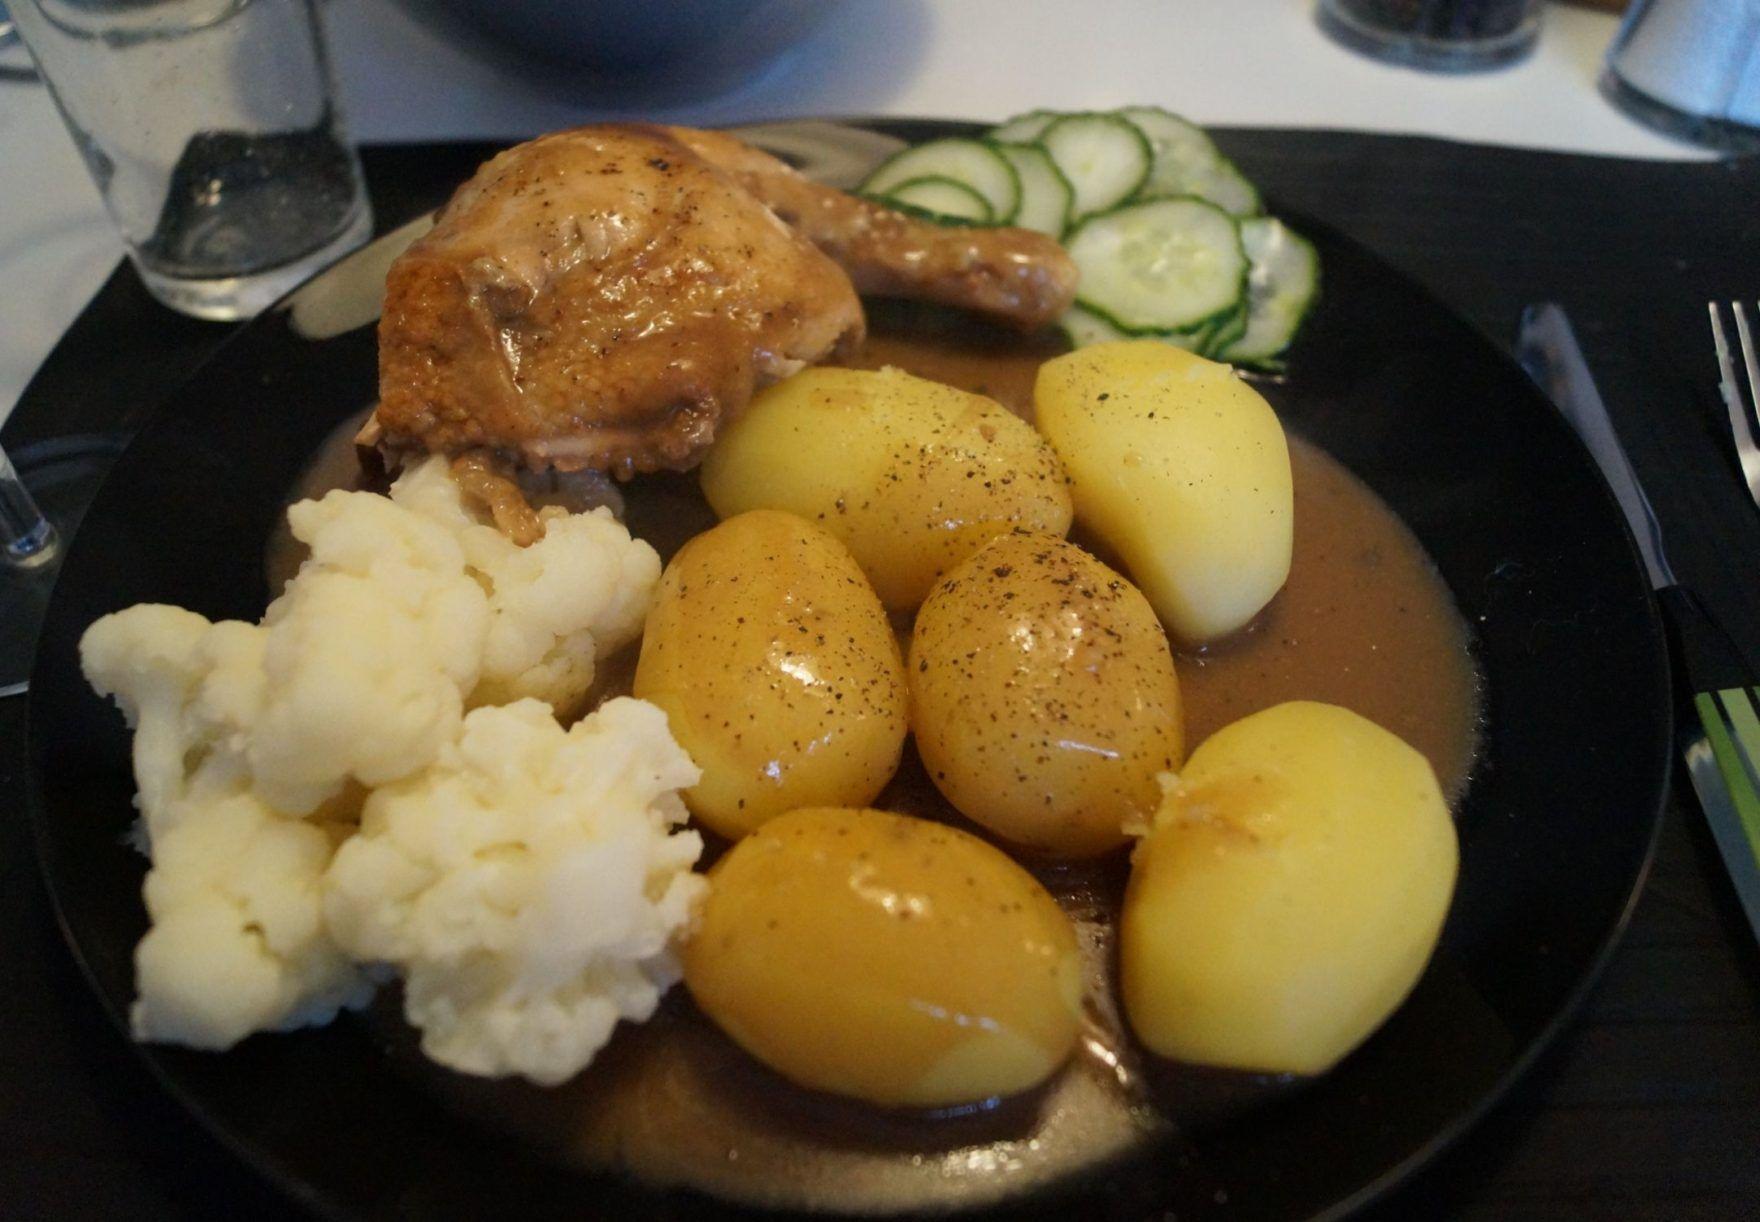 Grydestegt Kylling Med Brun Sauce Og Kartofler